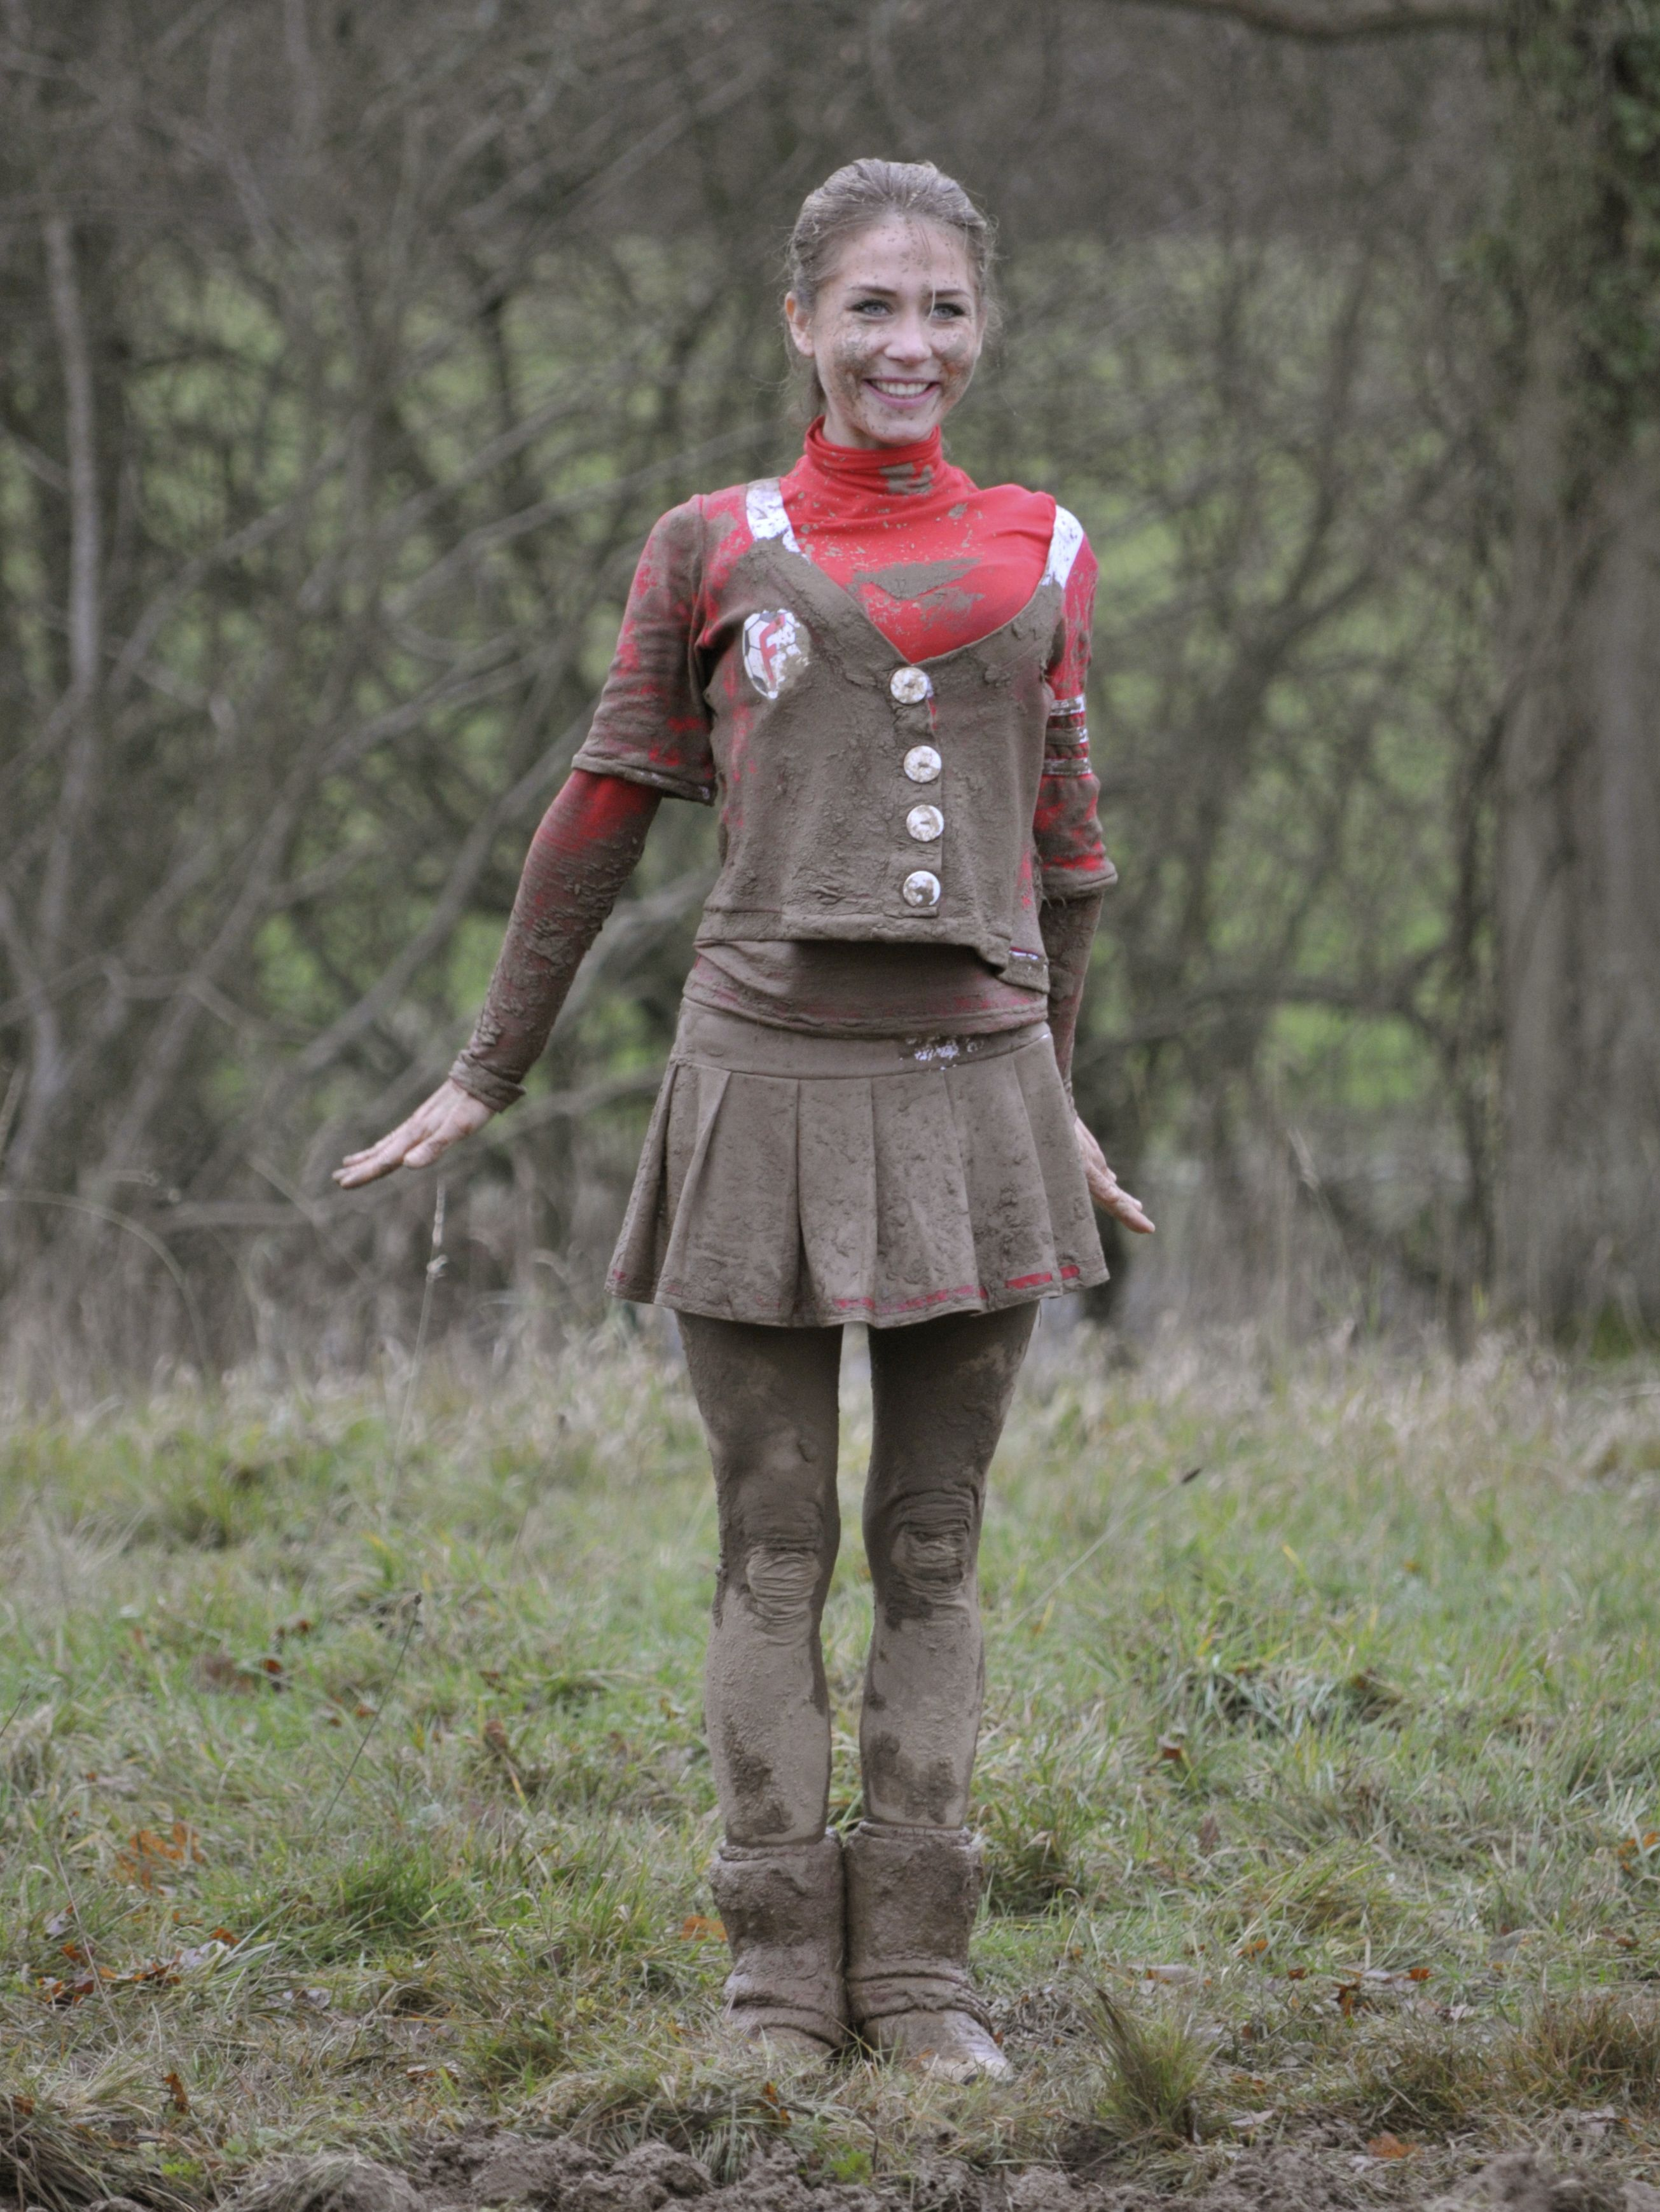 Girls Falling in Mud